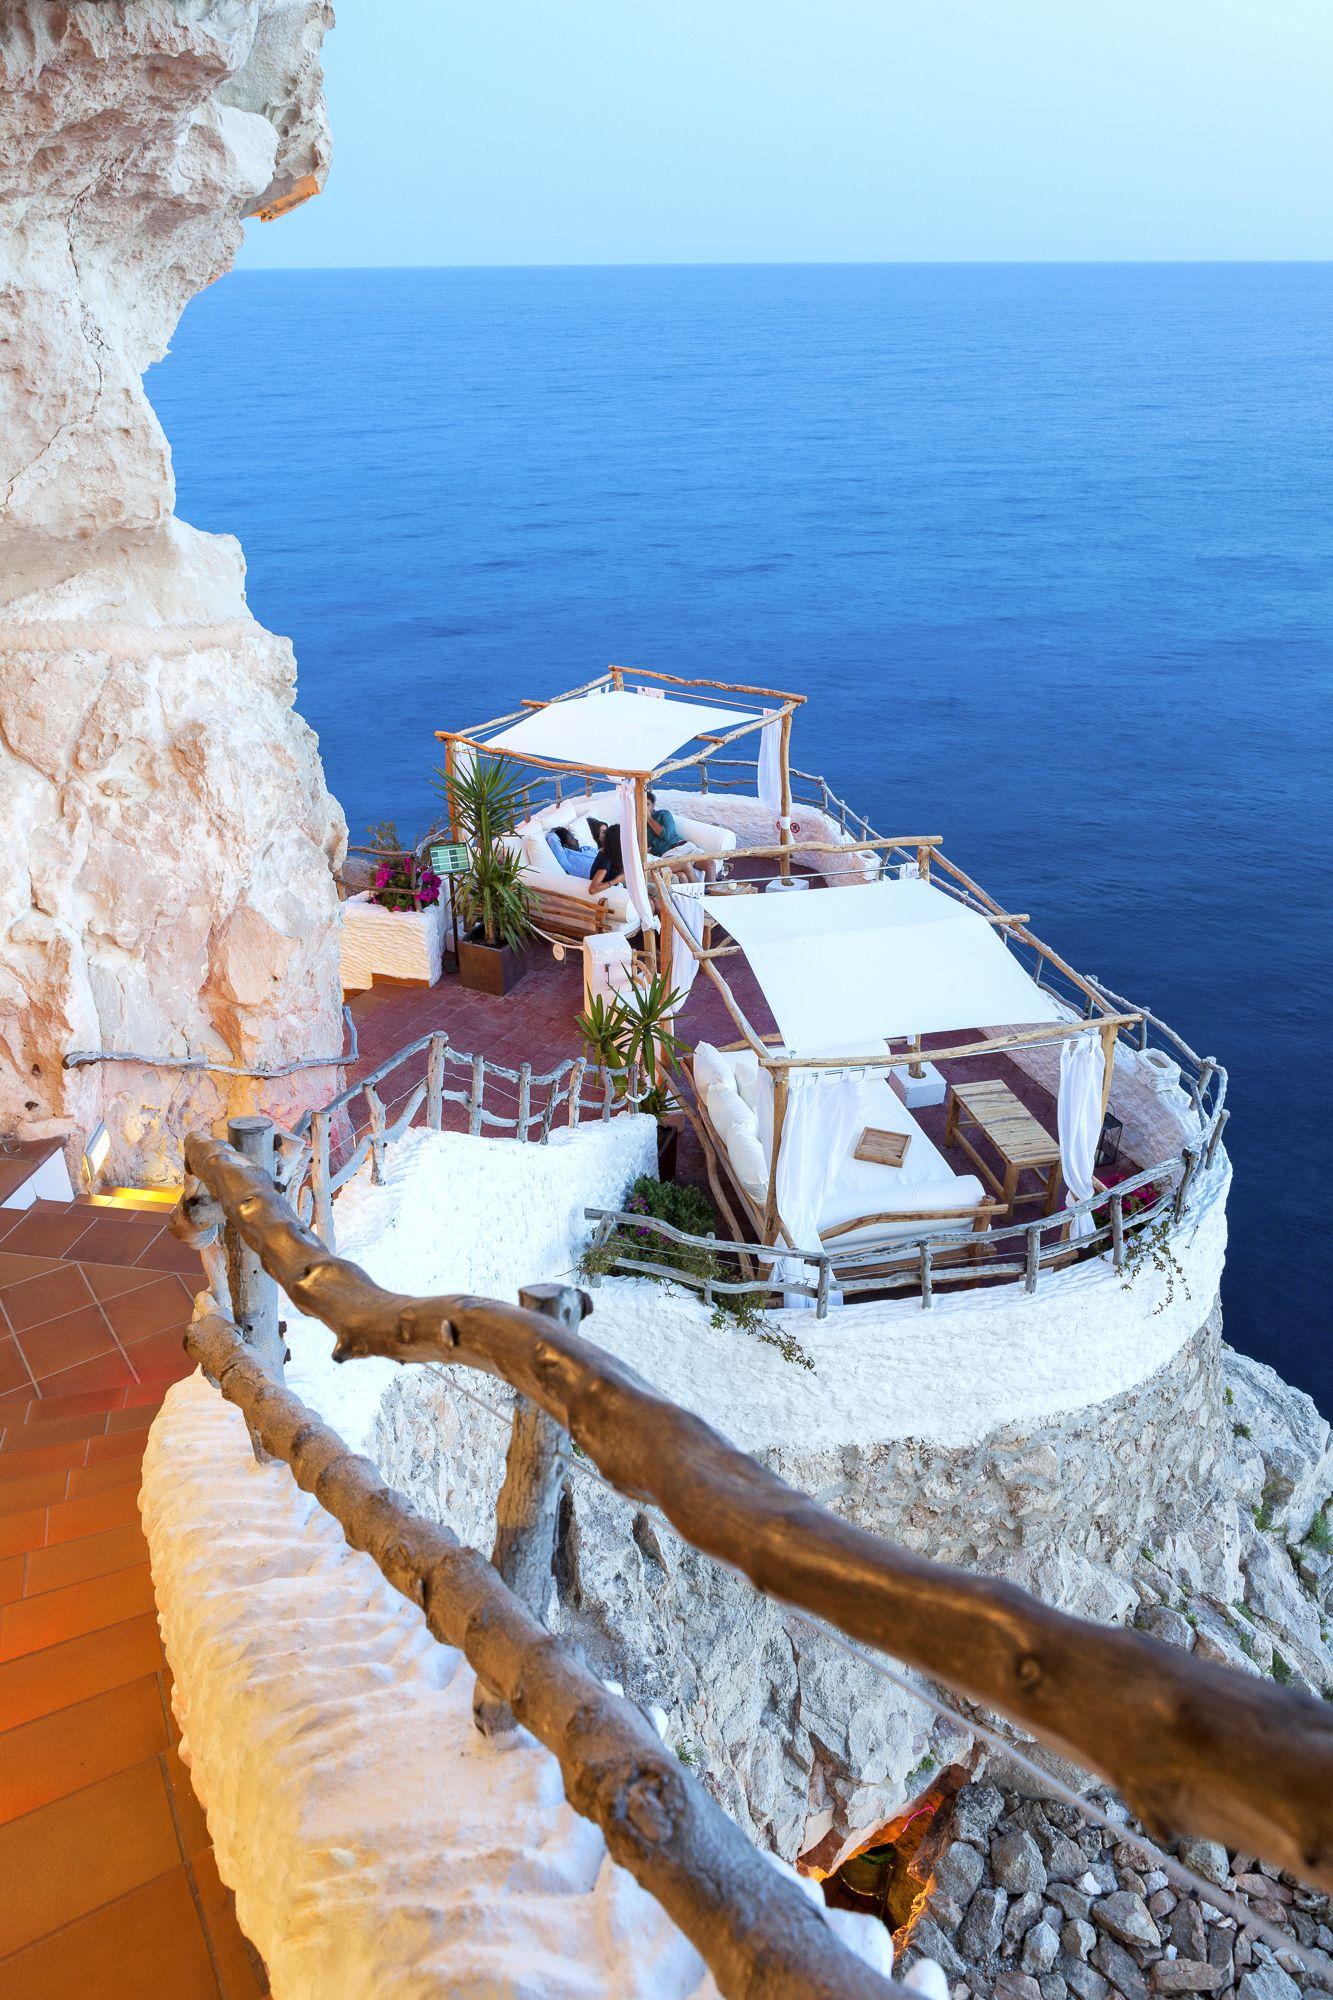 Skip Ibiza for this Lower-Key, Lesser-Known Island Destination